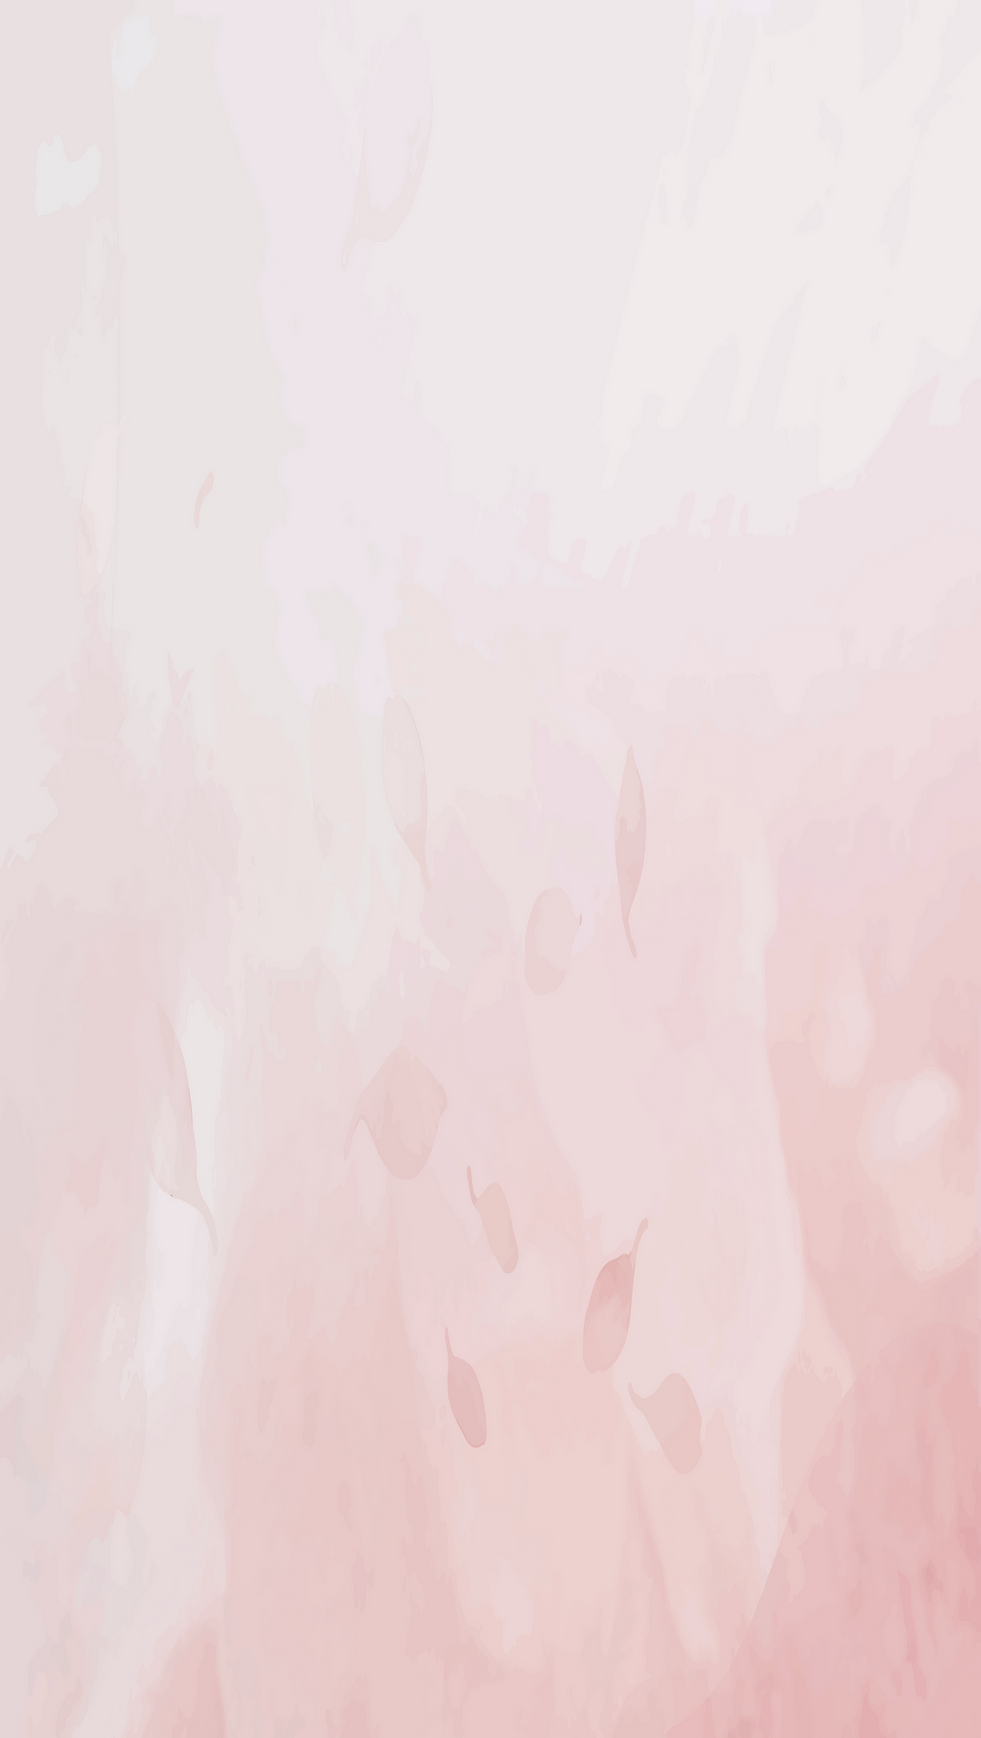 Background Sakura Kad Digital.png